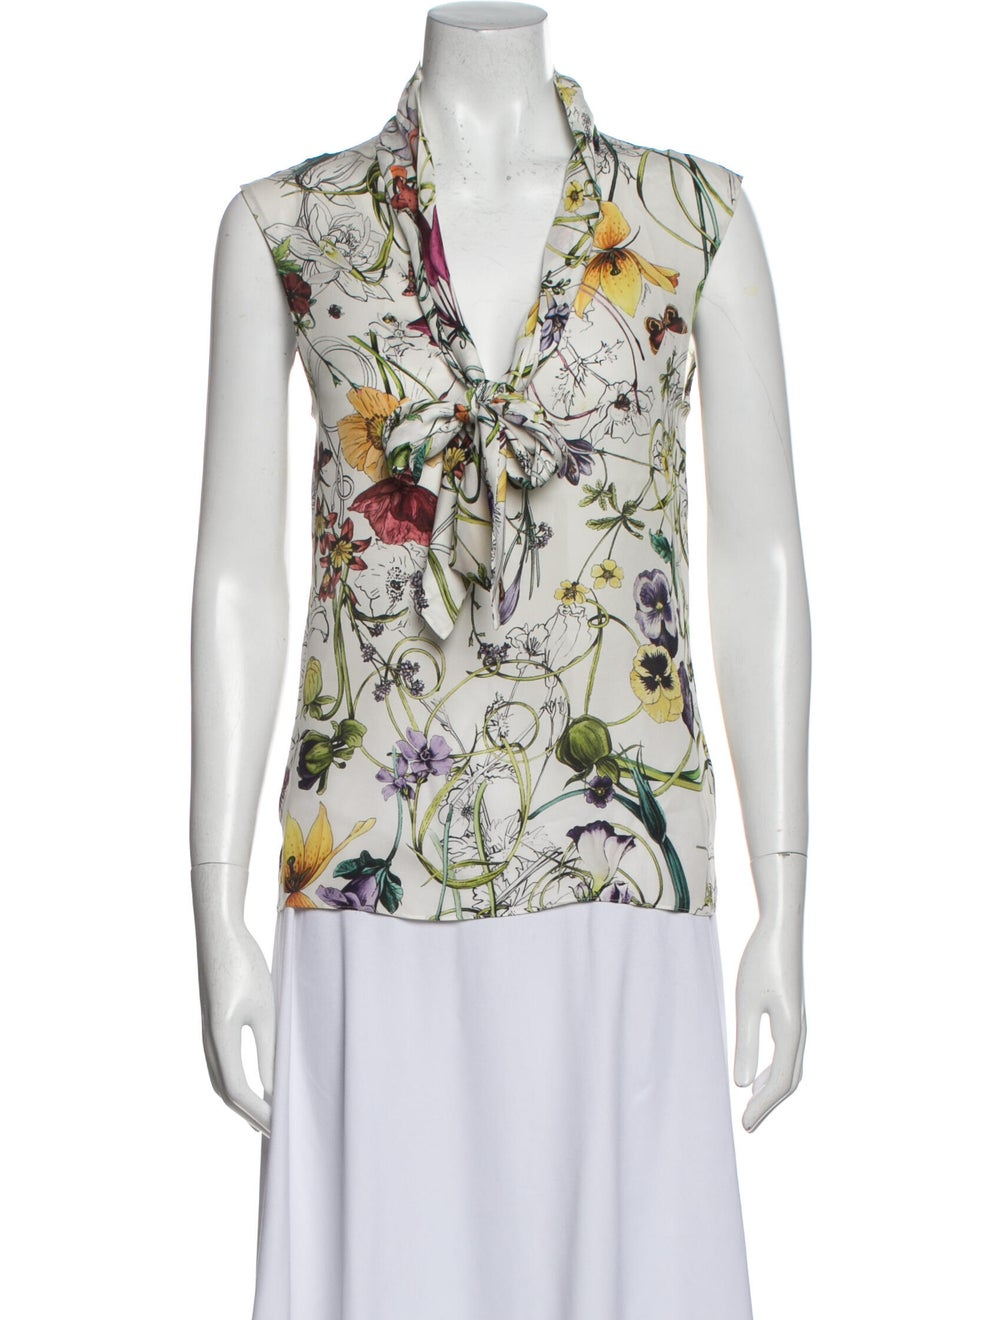 Gucci Silk Floral Print Blouse White - image 1